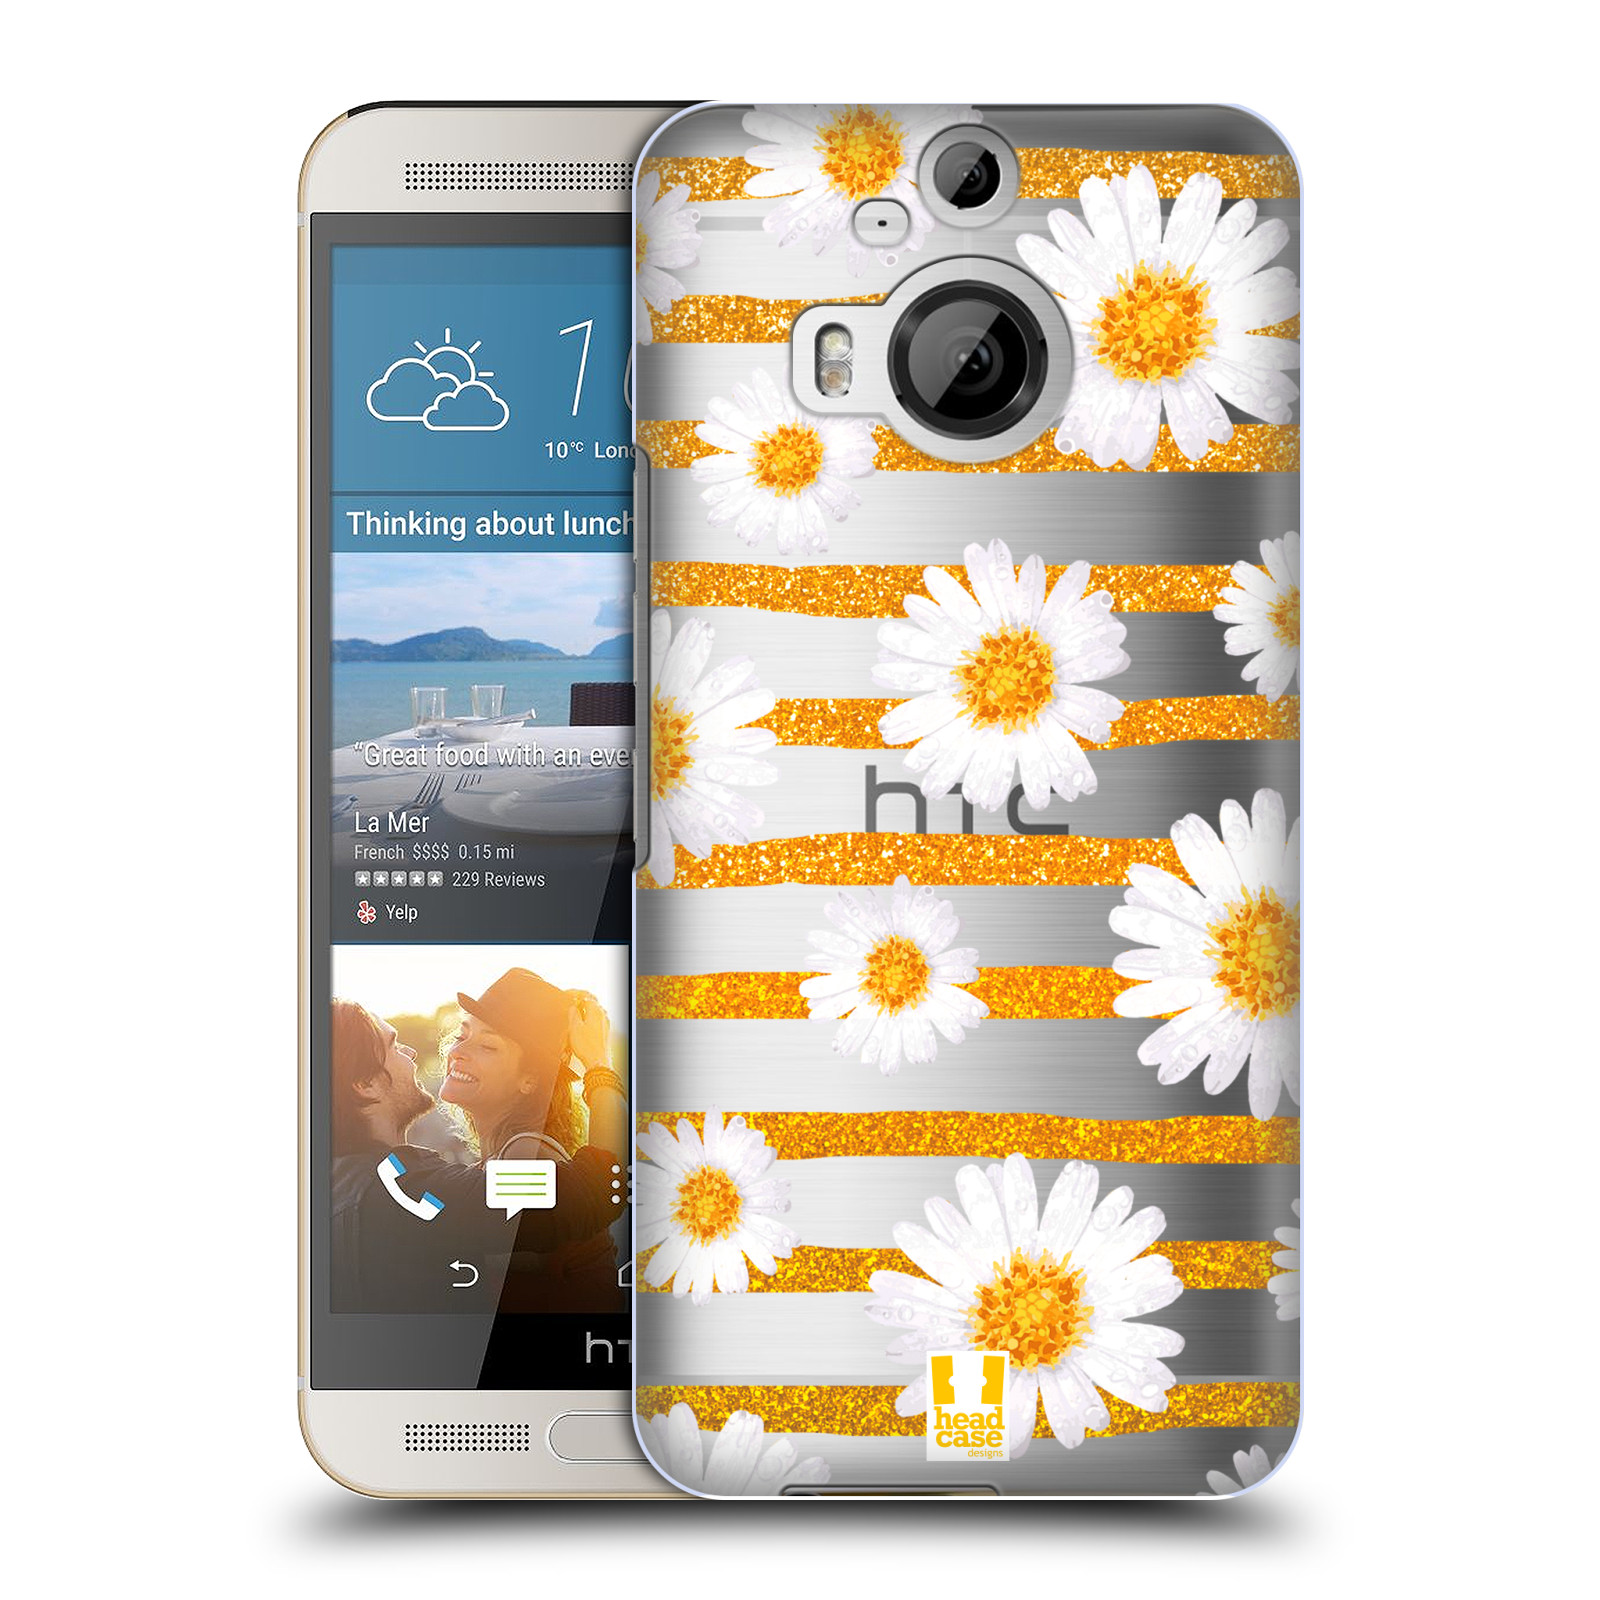 HEAD-CASE-DESIGNS-TREND-CRAZE-HARD-BACK-CASE-FOR-HTC-PHONES-2